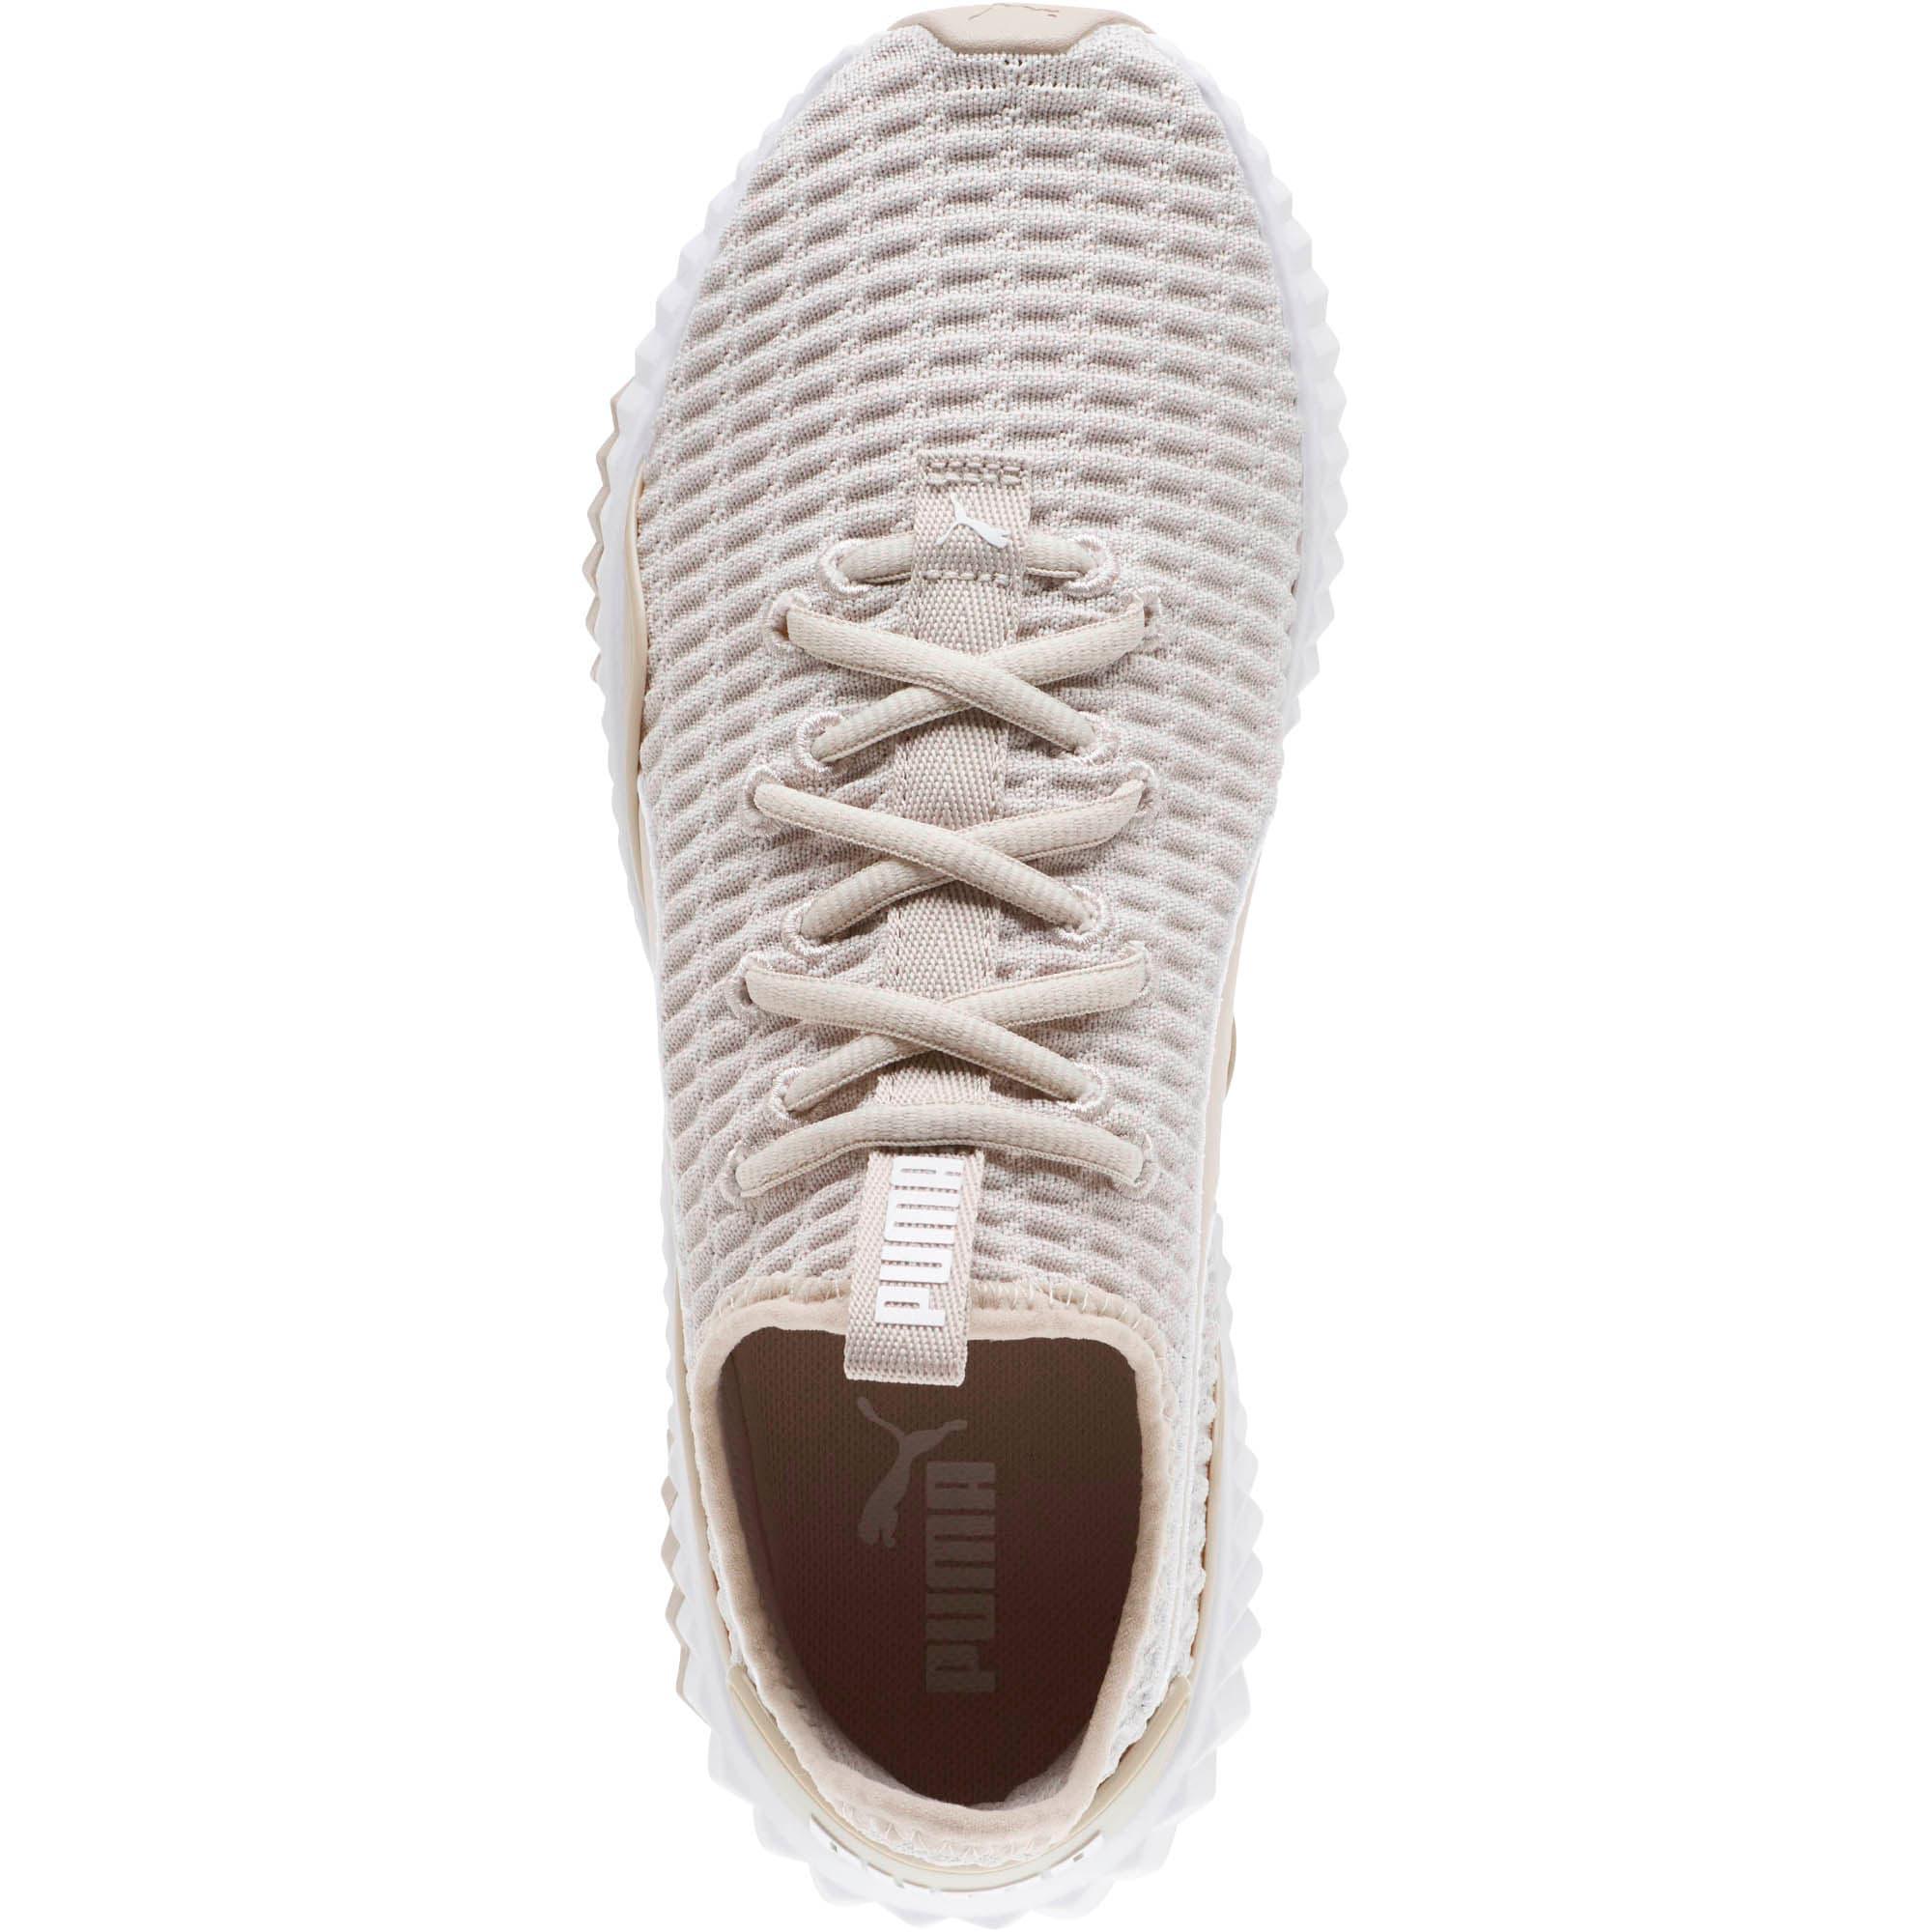 Thumbnail 5 of Defy Women's Training Shoes, Silver Gray-Puma White, medium